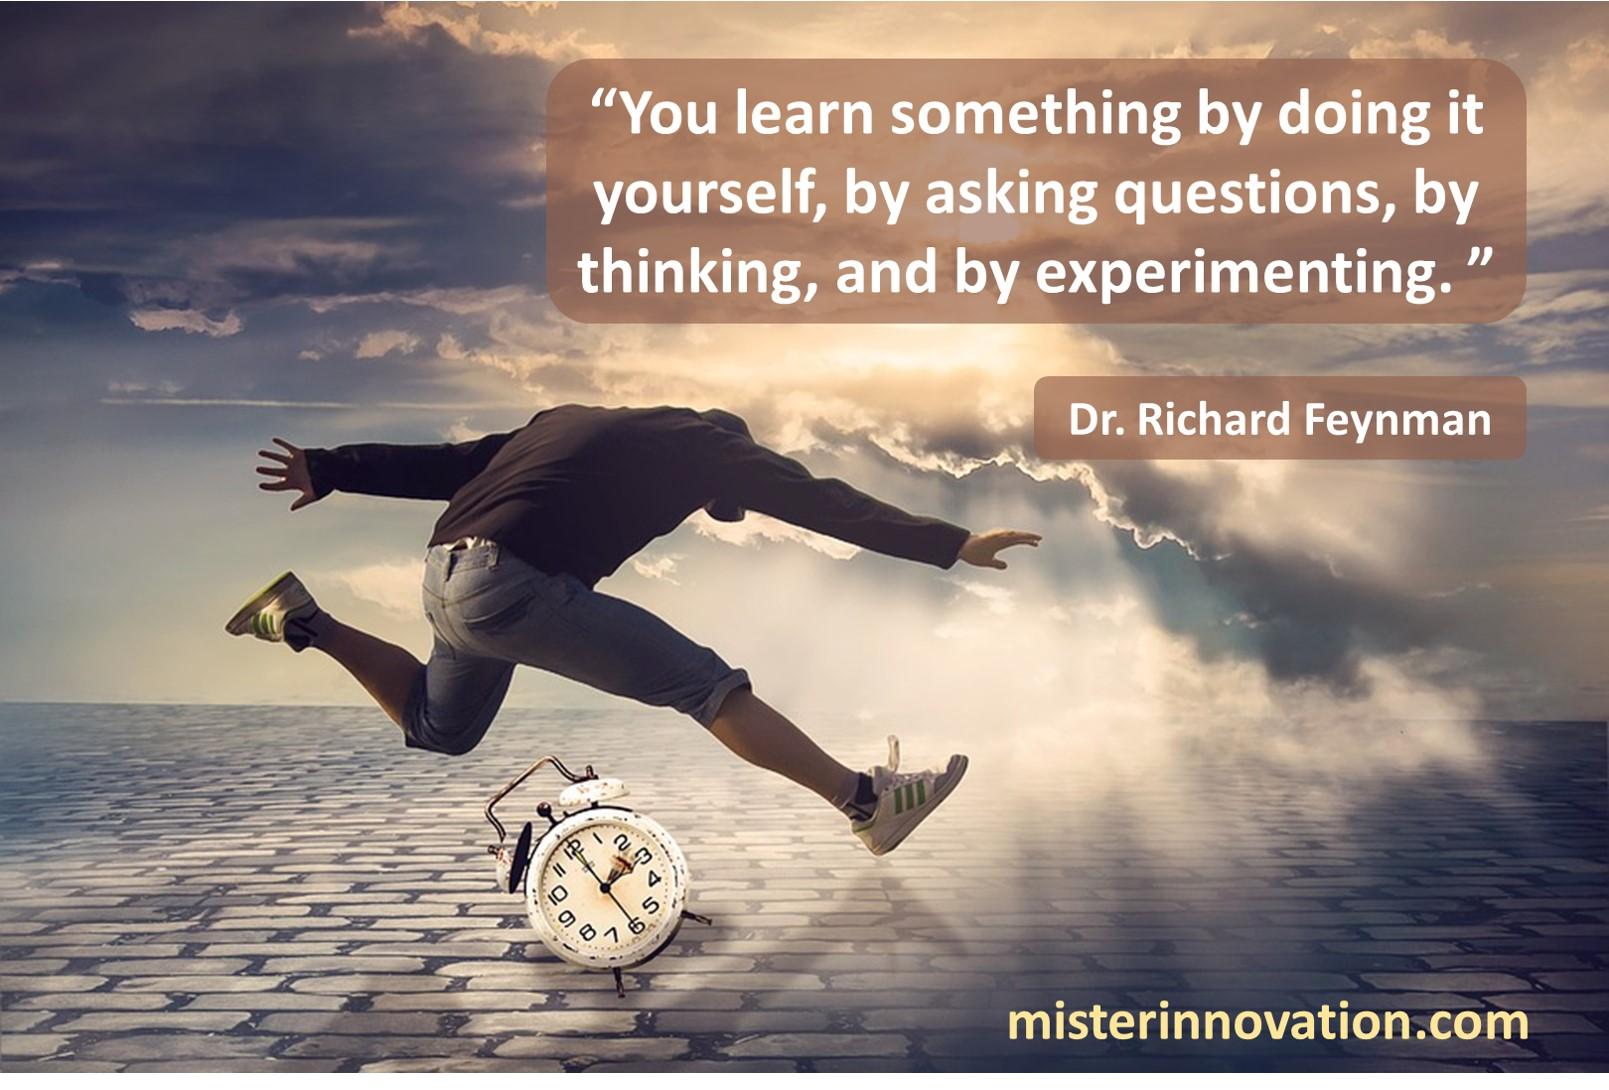 RIchard Feynman Learn by Doing